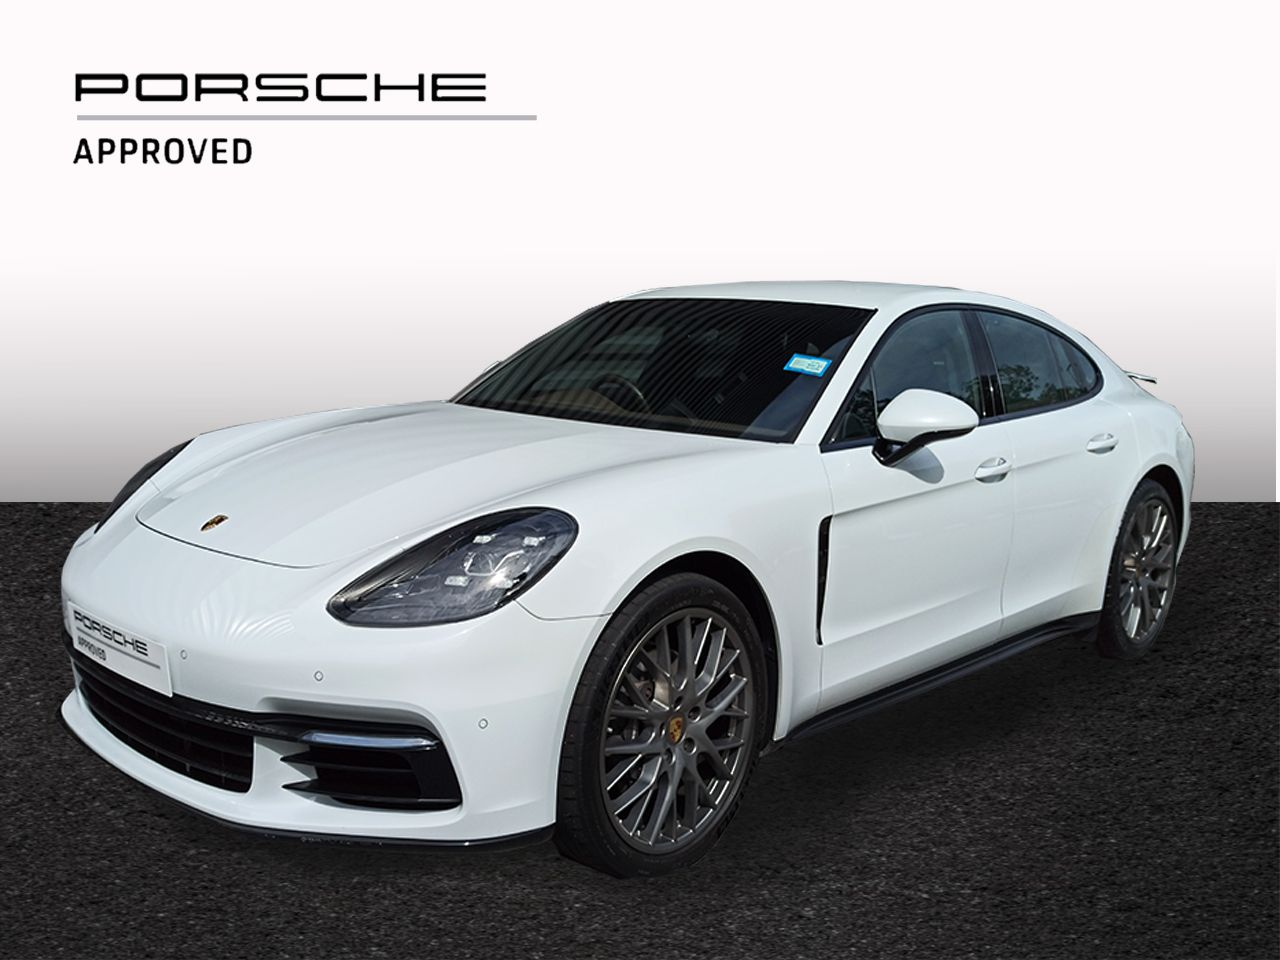 2017 Porsche Panamera – 1